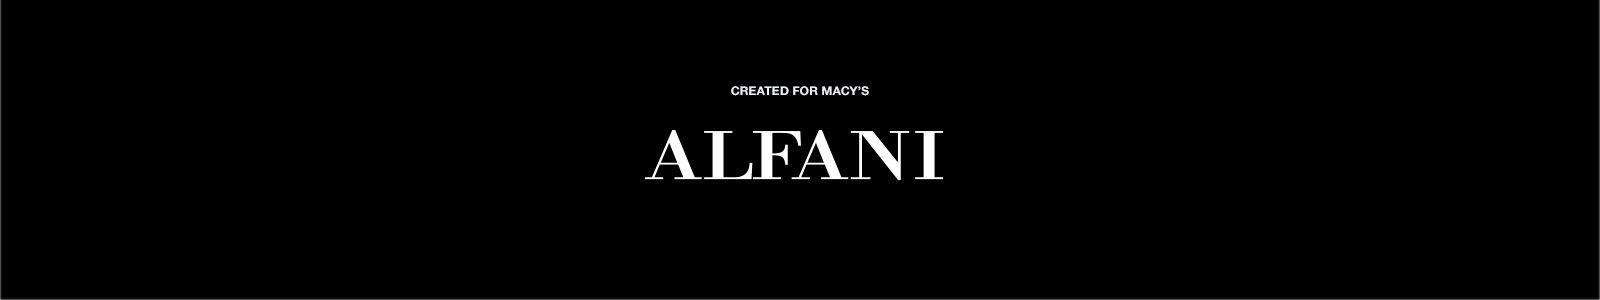 Created For Macy's, Alfani